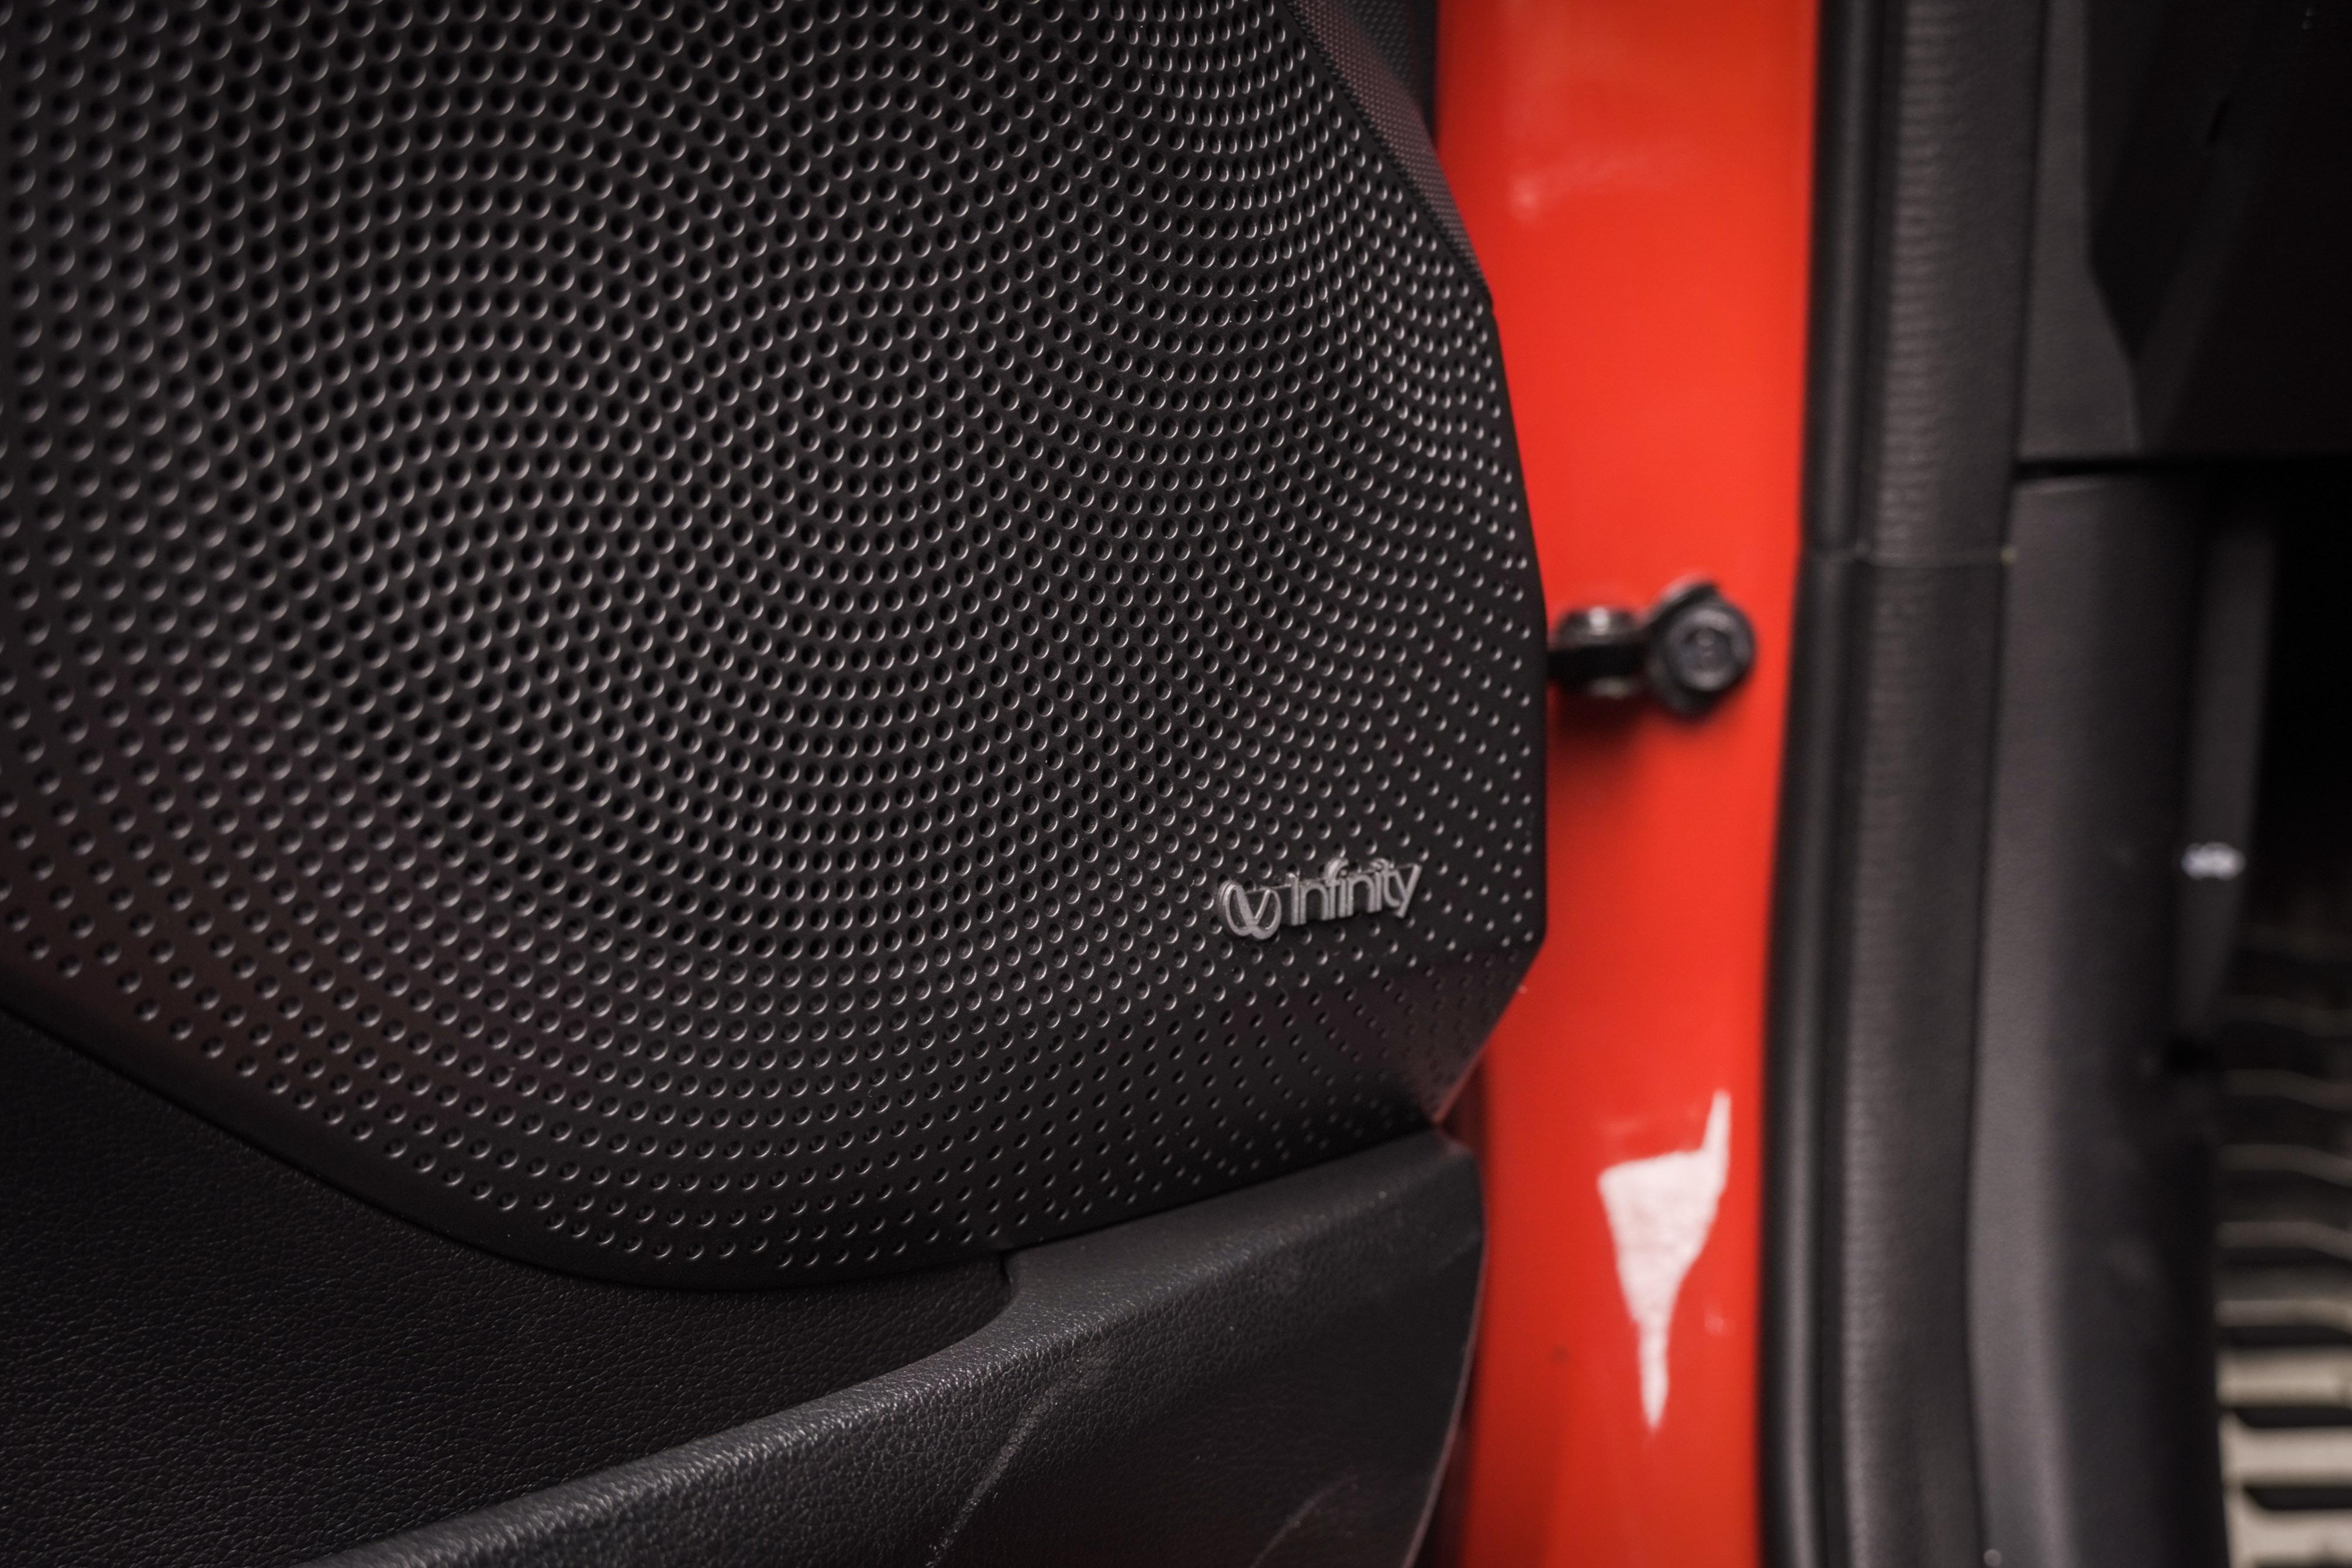 Veloster 提供 Infinity 的 8 支揚聲器及重低音系統。